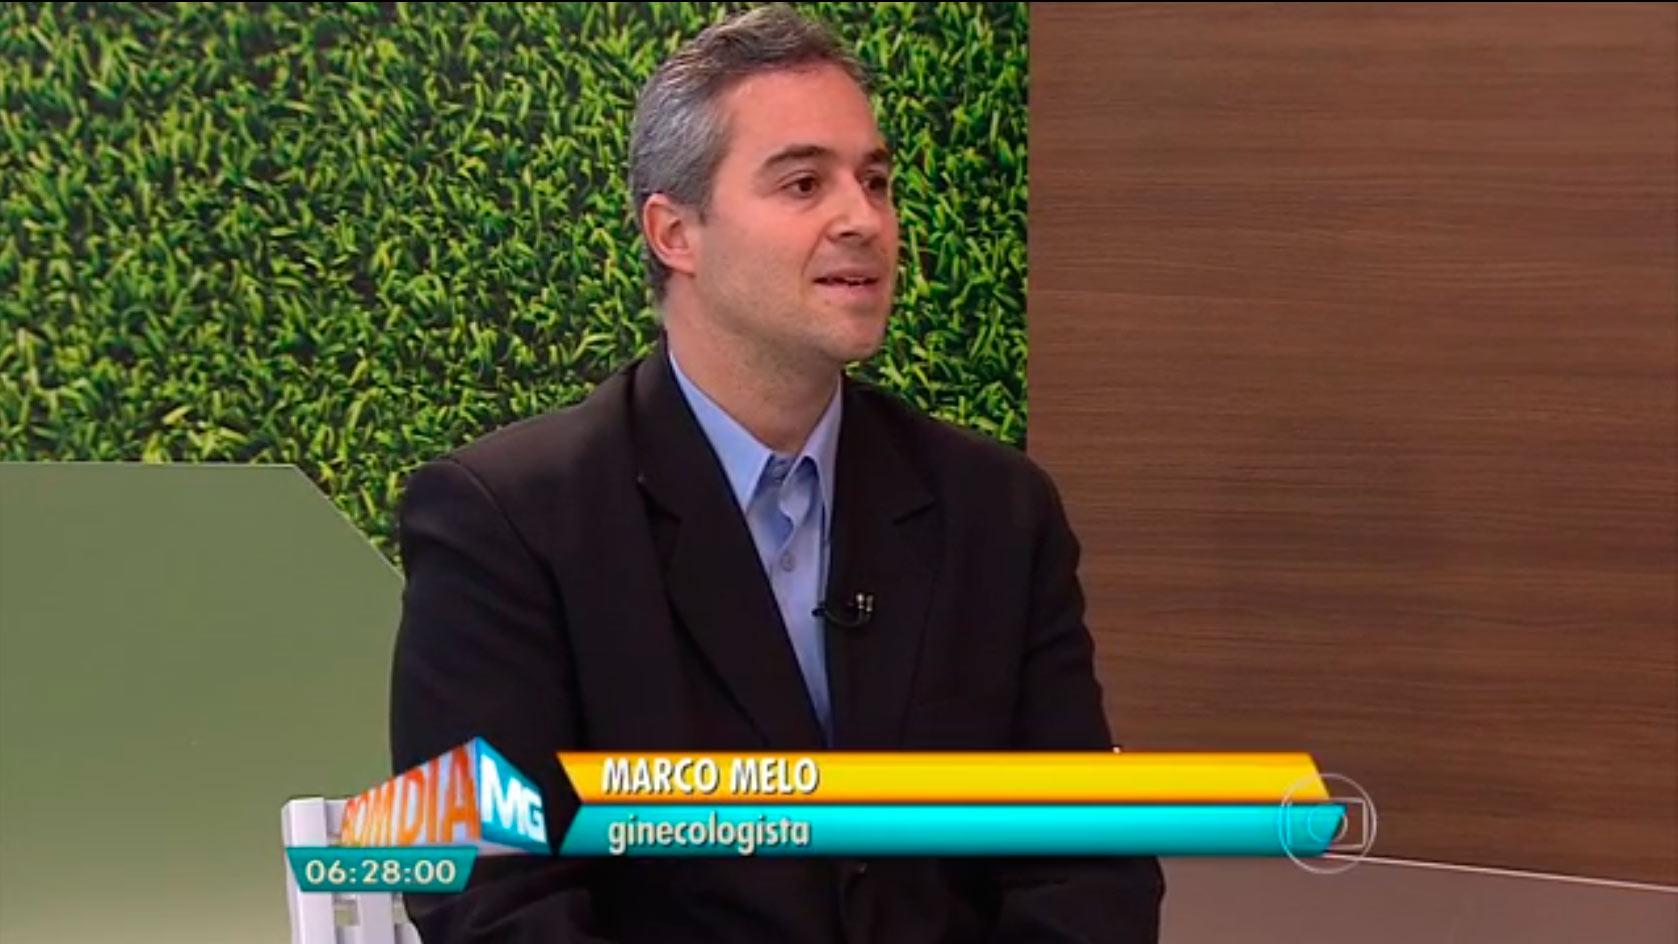 Dr-Marco-Melo-reproducao-assistida-clinica-vilara